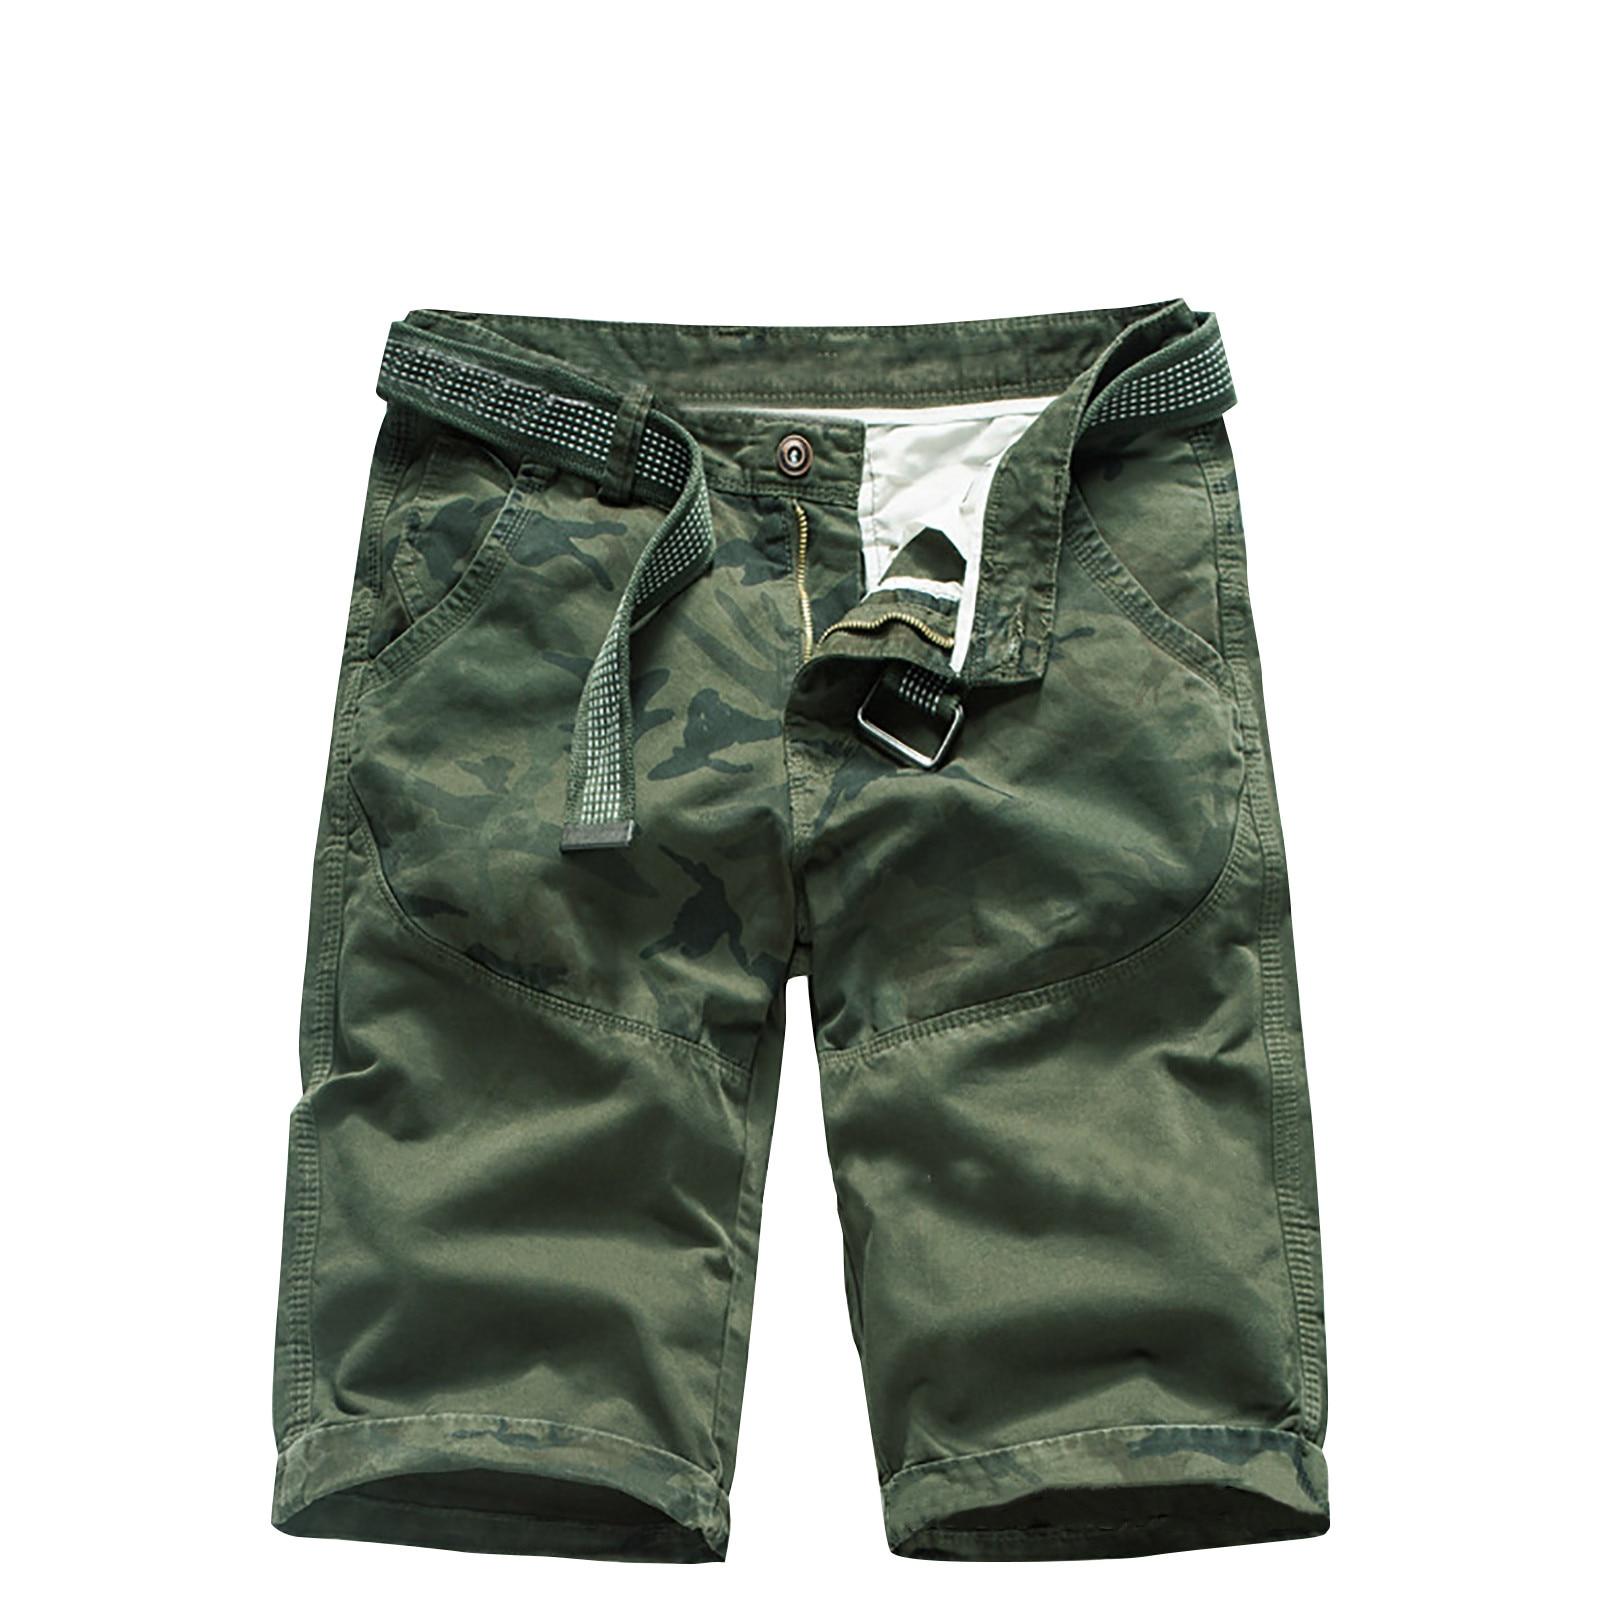 2021 Summer New Cotton Cargo Shorts Men Casual Multi-Pocket Military Shorts Pants Loose Work Army Tactical Shorts Men